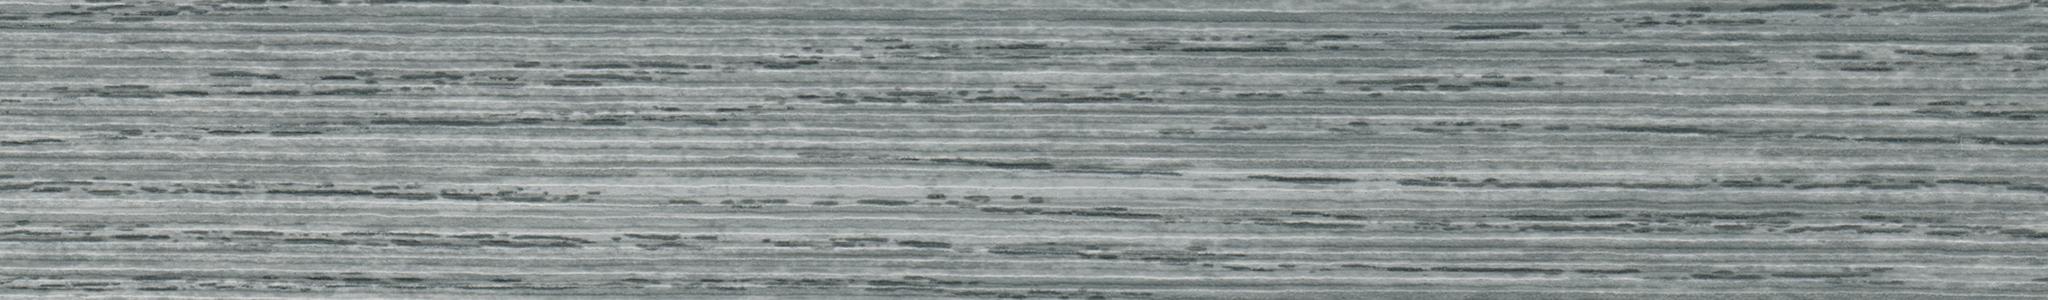 HD 24320 ABS Edge Silver Oak Pore